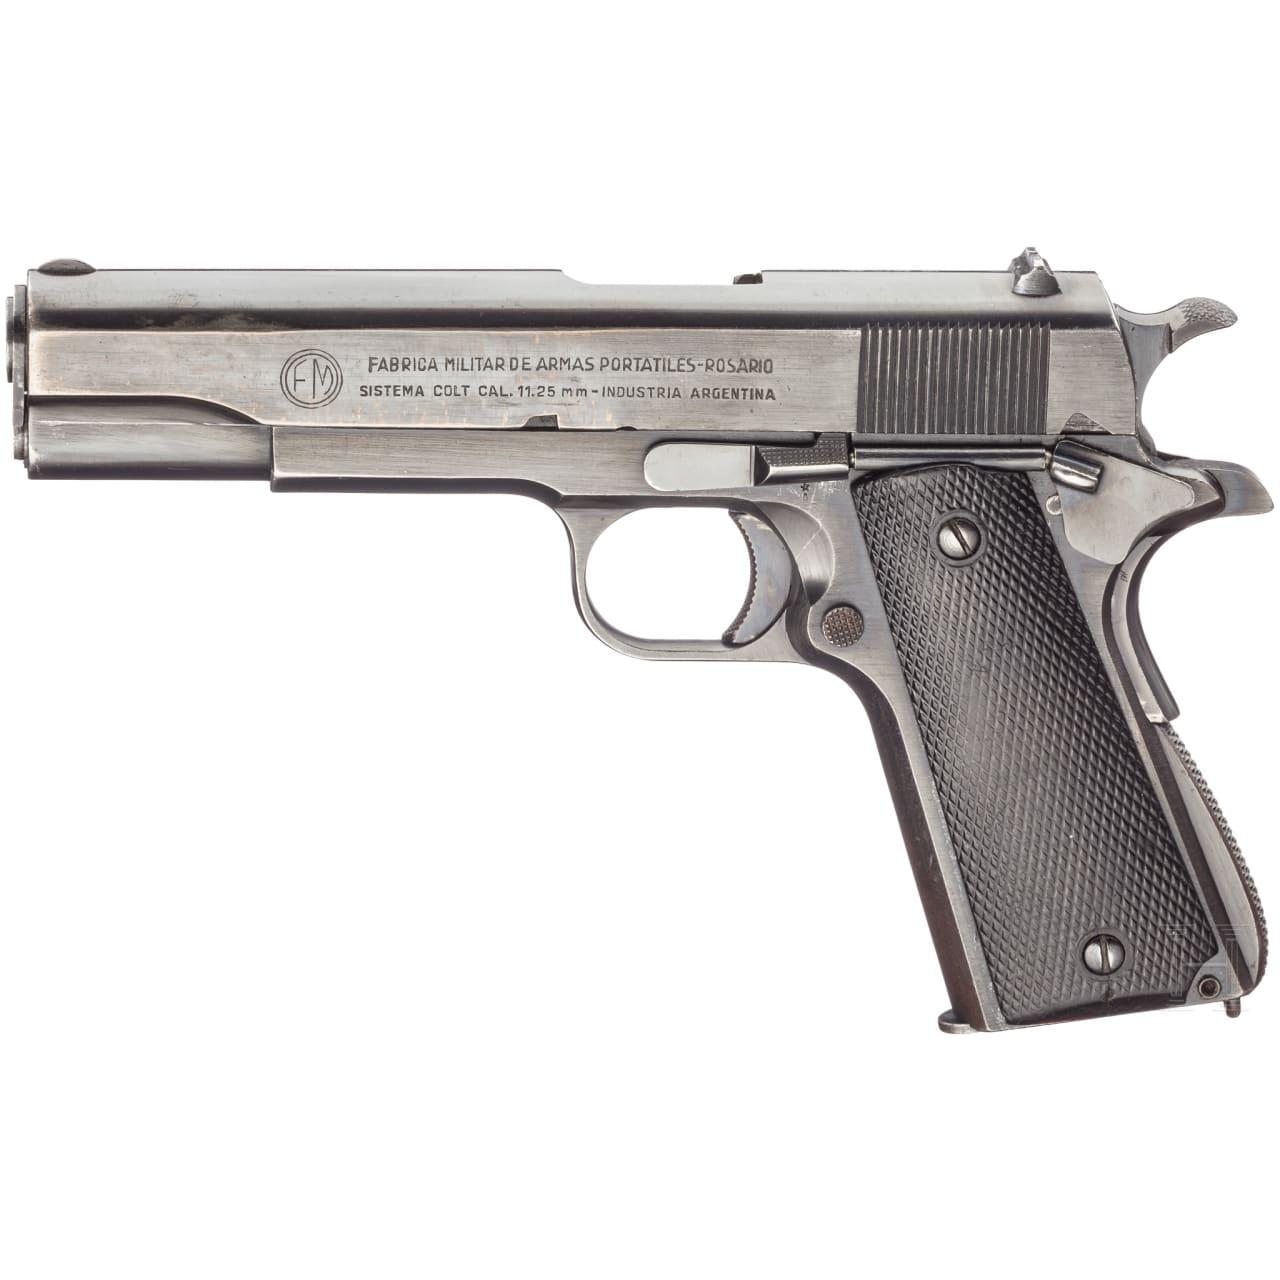 FMAP System Colt Mod. 1927, Polizei